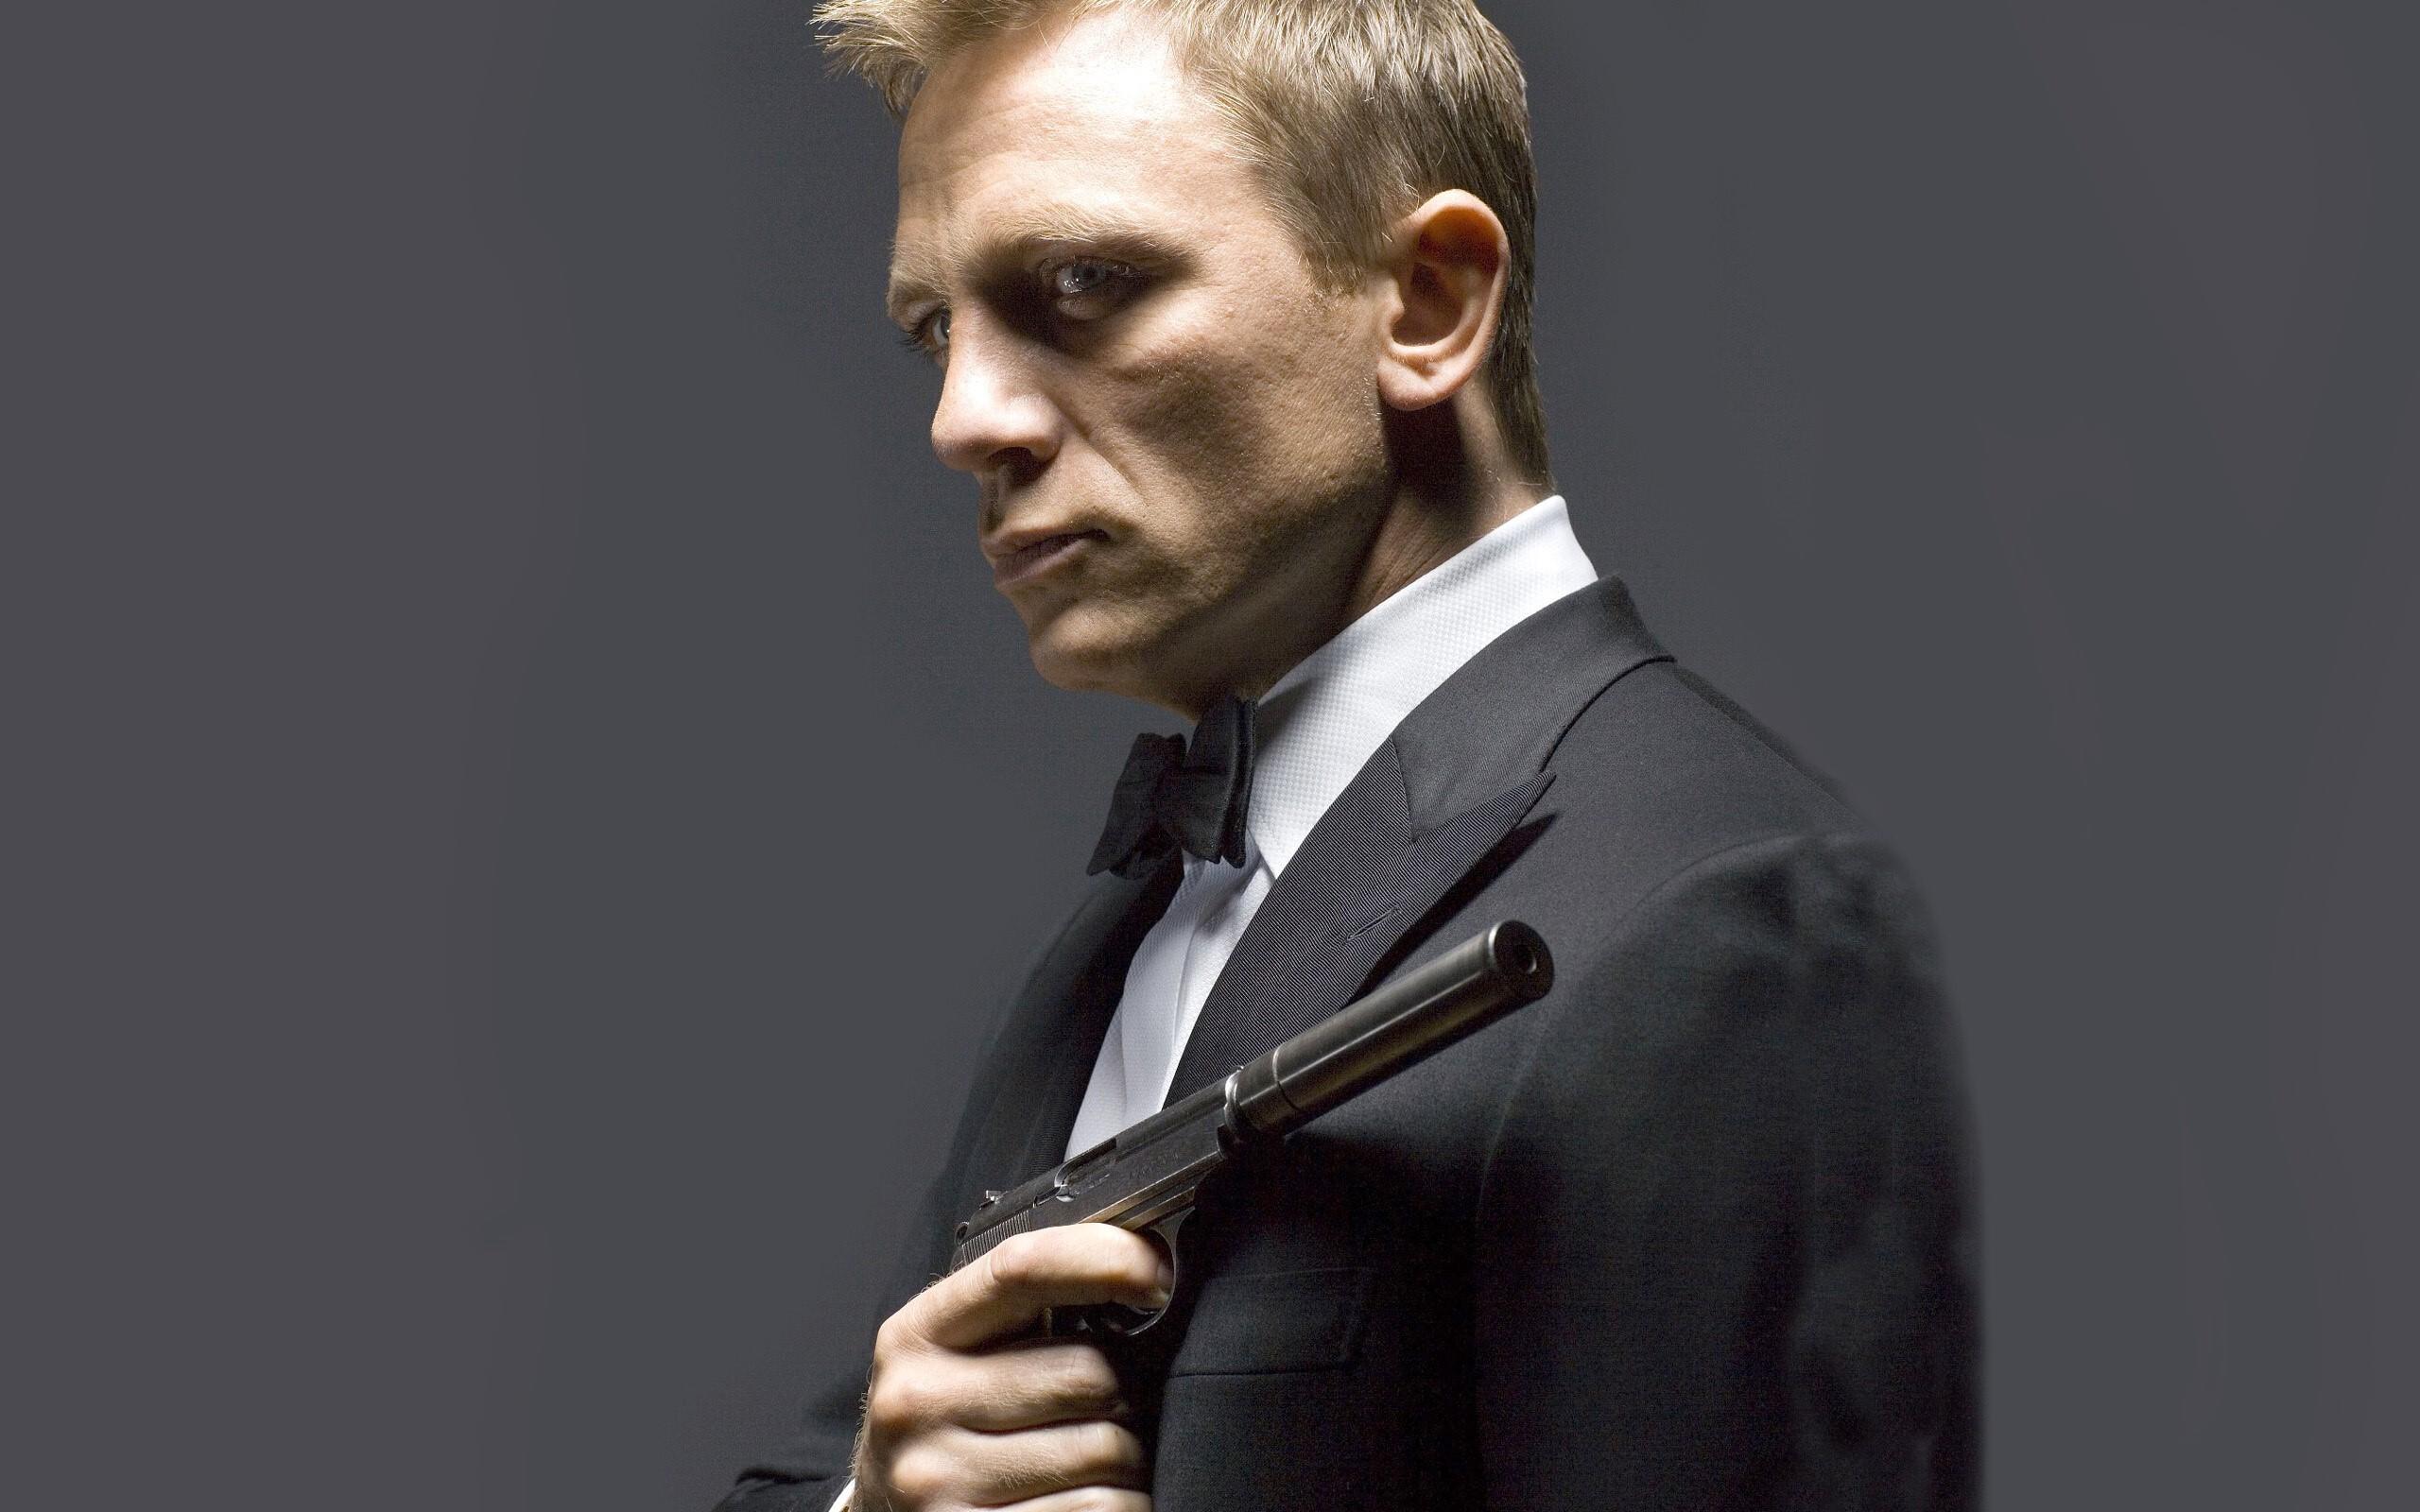 daniel craig popular english actor with gun wallpaper | hd wallpapers